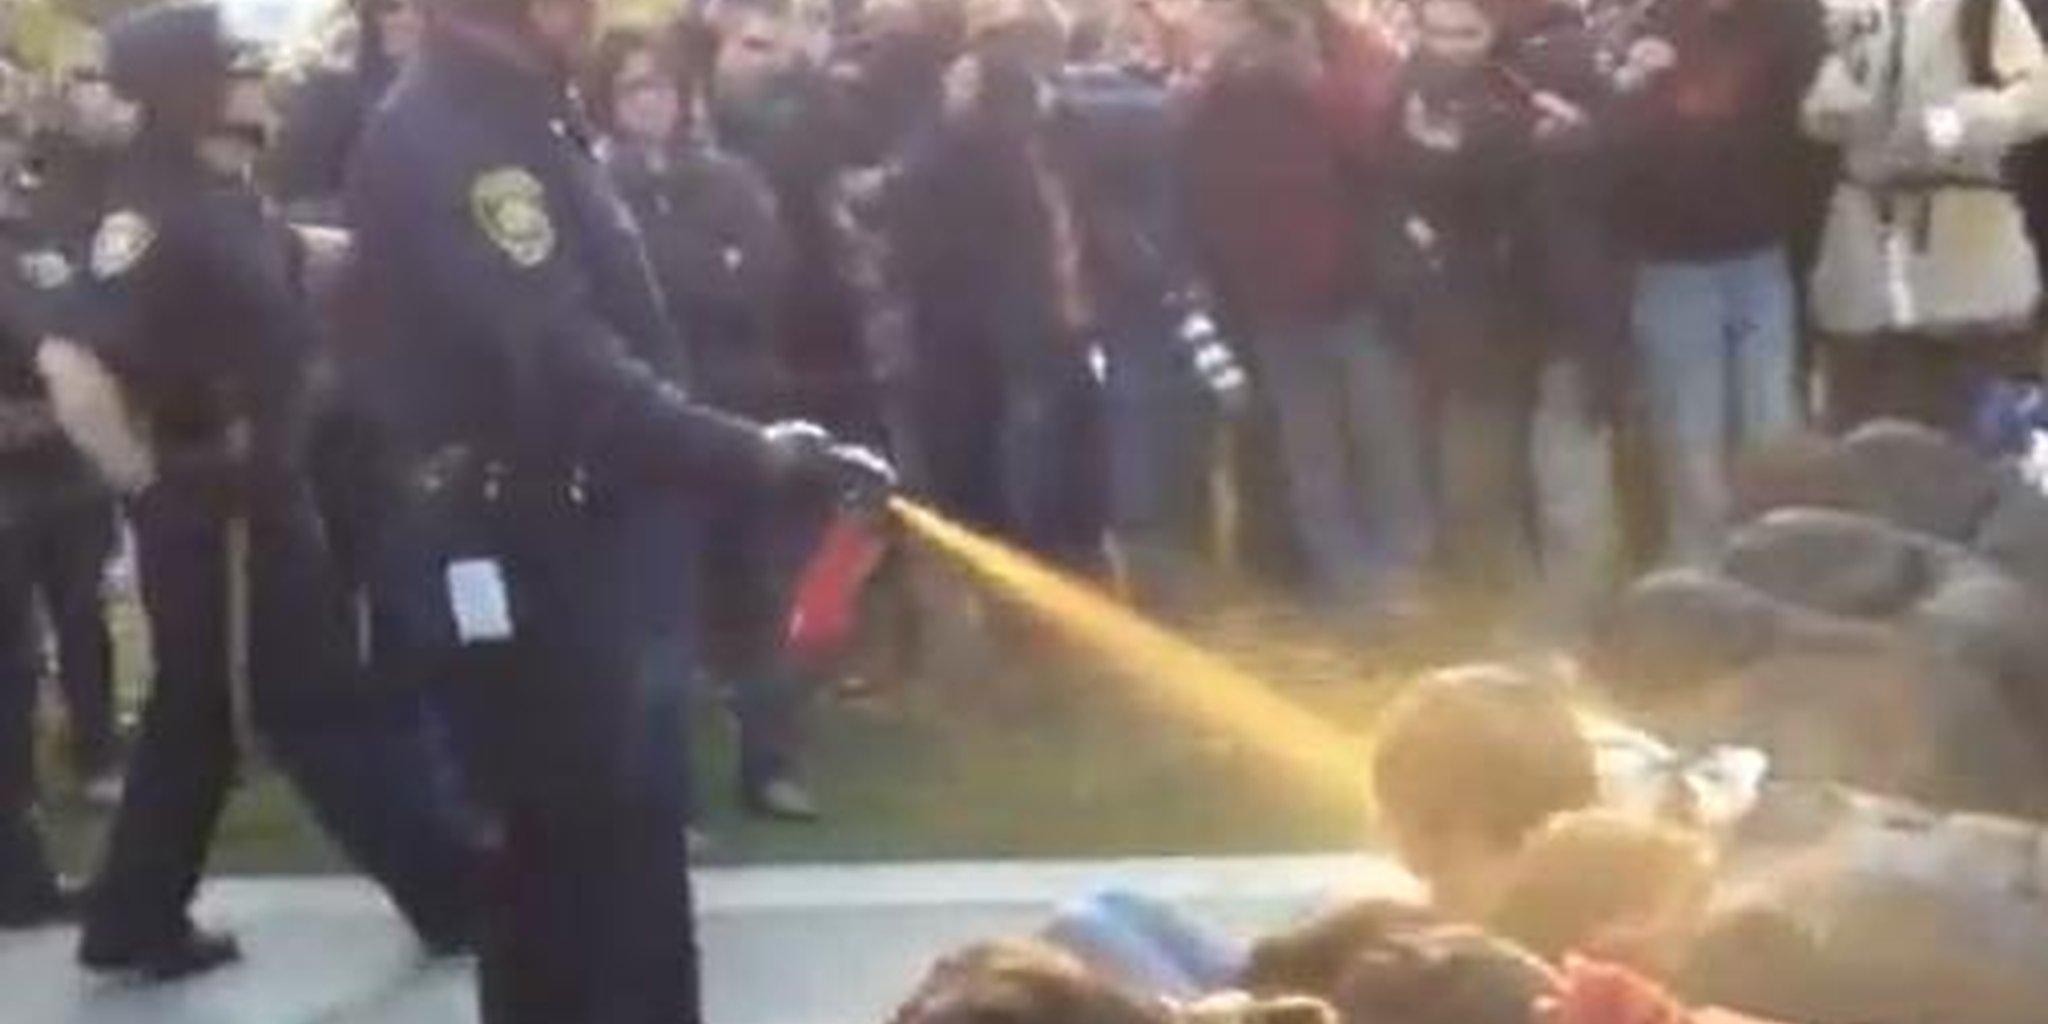 UC Davis peppersprayed